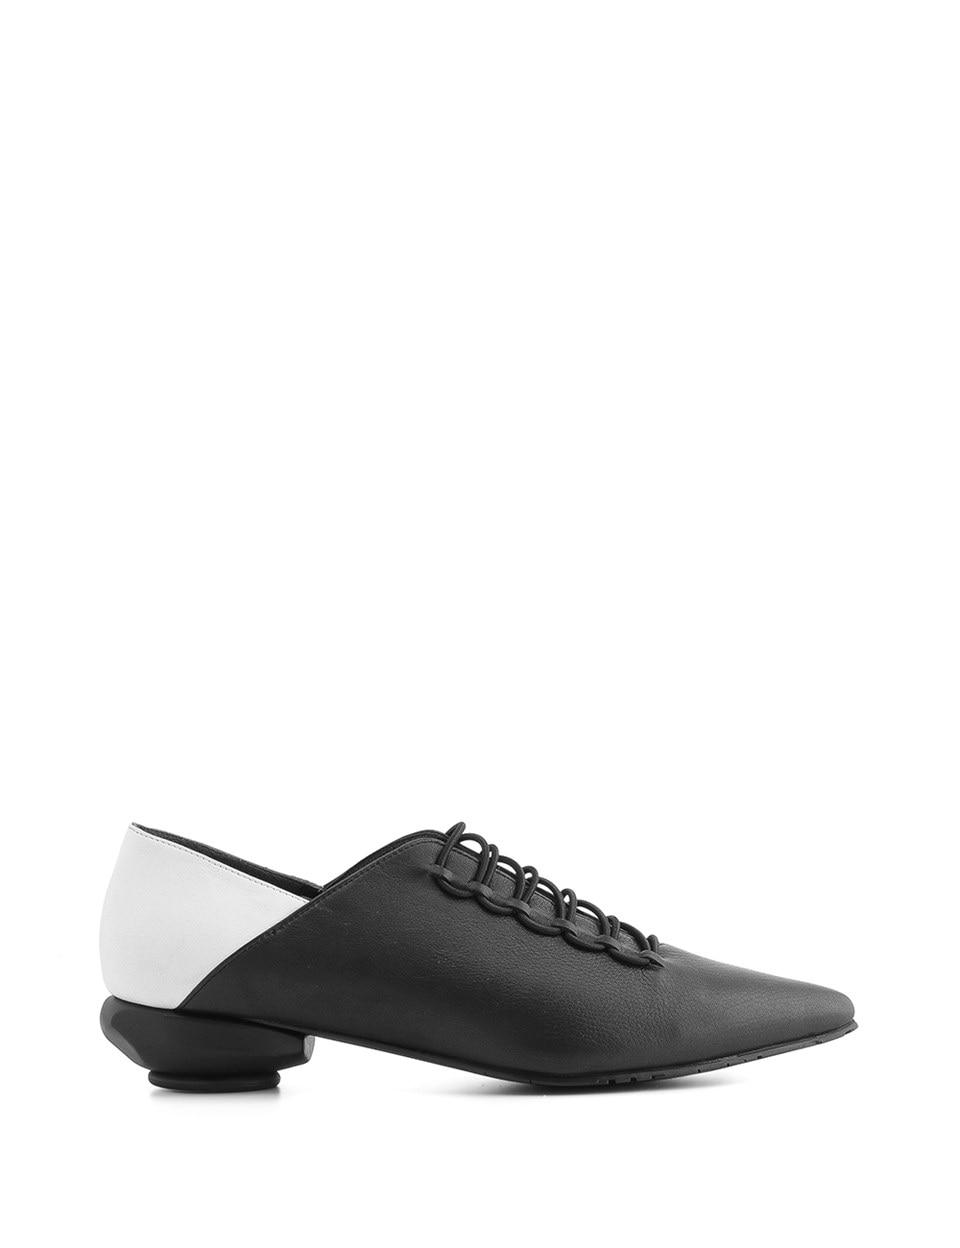 ILVi-Genuine Leather Handmade Wella Women's Moccasin Black Matte-White Women Shoes 2020 Spring Summer (Made in turkey)